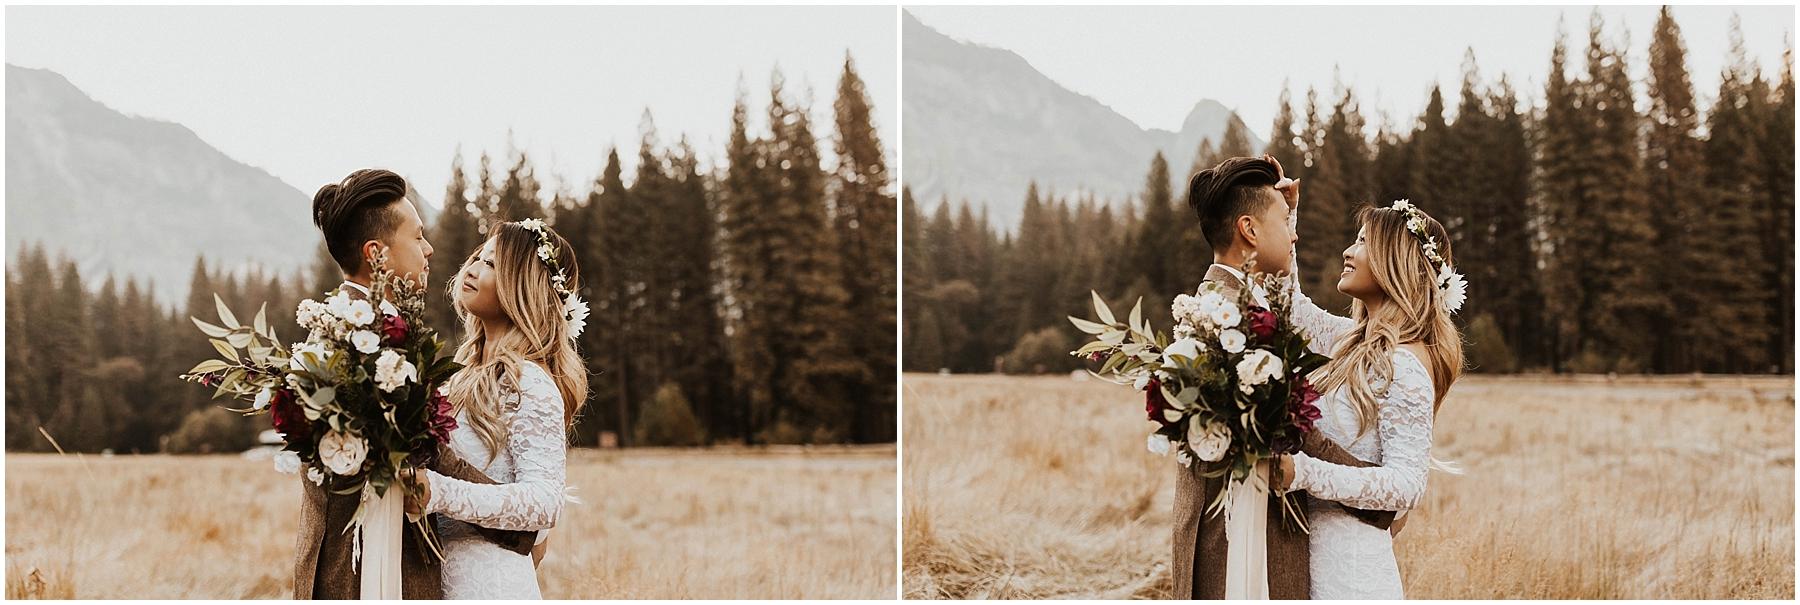 Yosemite_elopement_0009.jpg